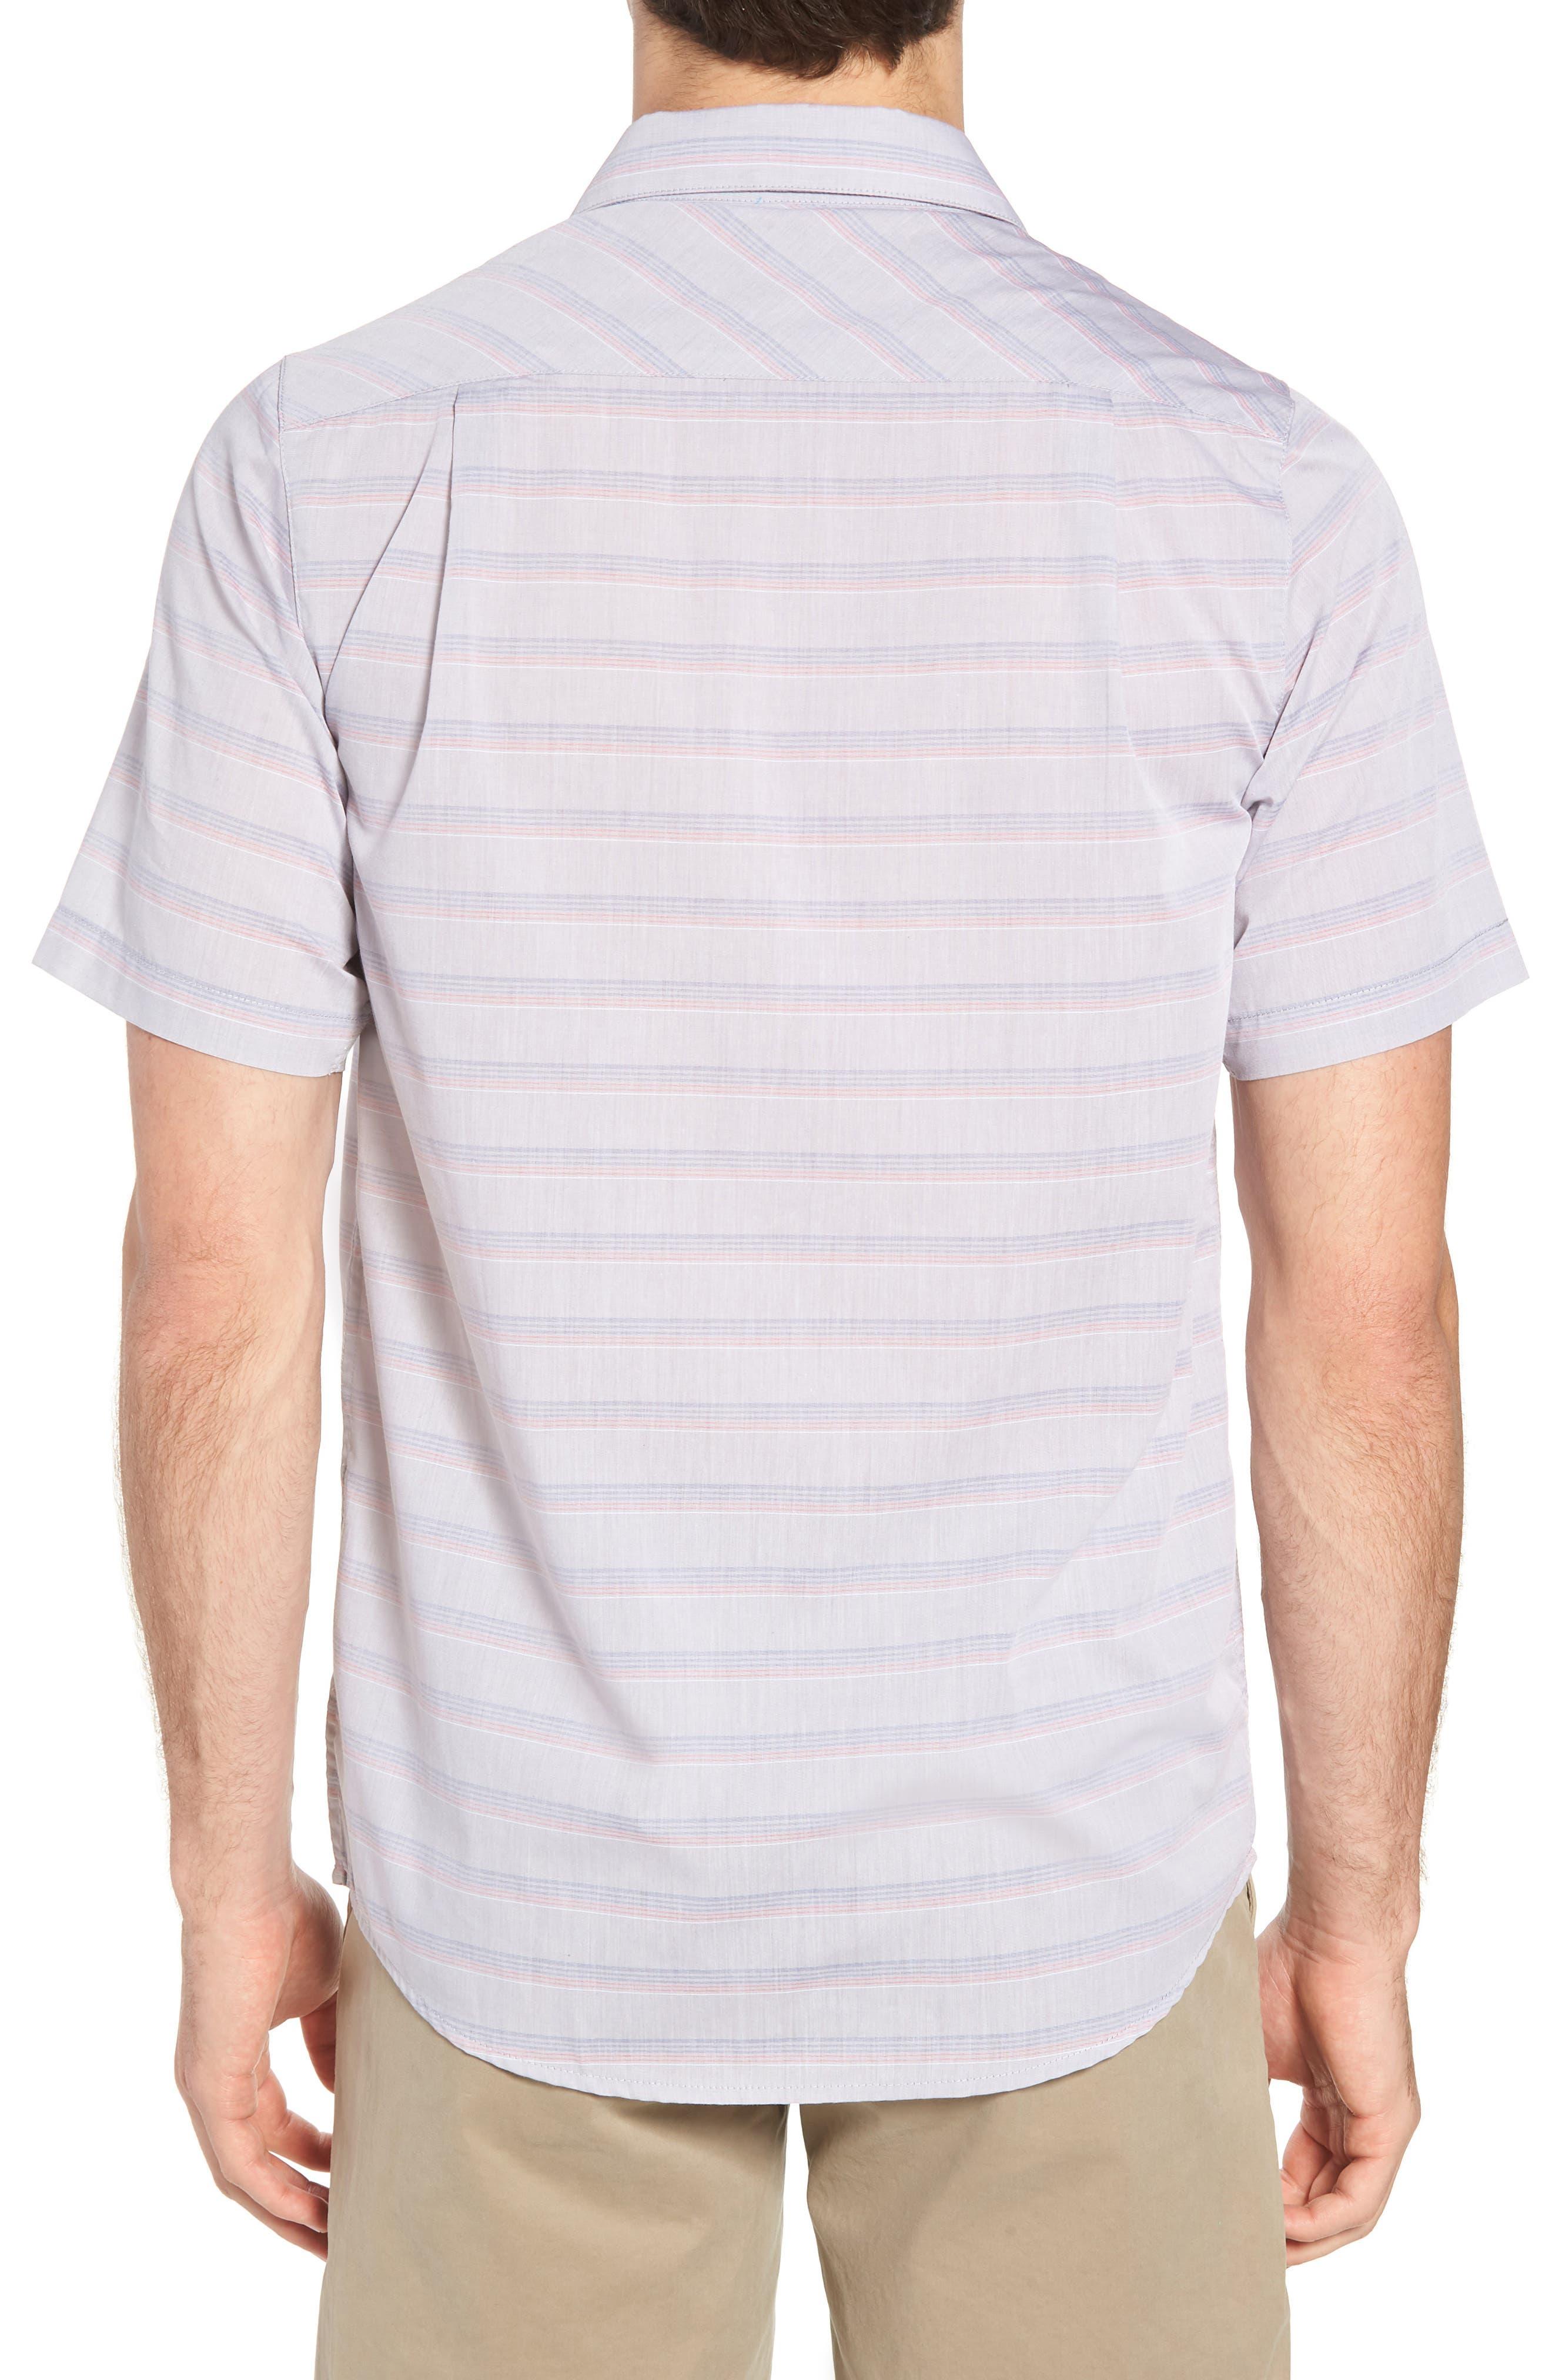 Comet Regular Fit Short Sleeve Sport Shirt,                             Alternate thumbnail 2, color,                             020